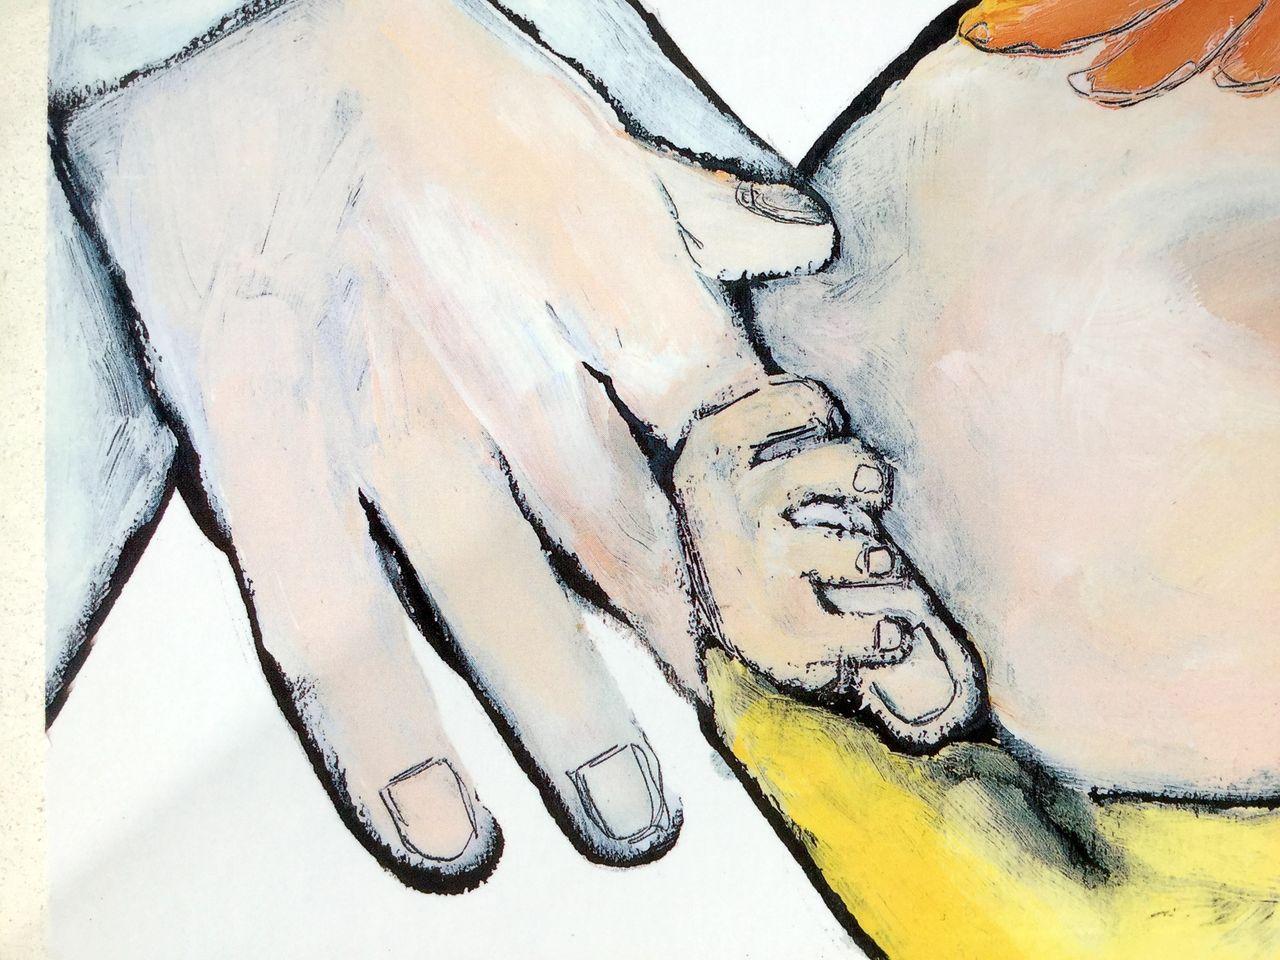 Émile Jadoul, Le mani di papà, Babalibri